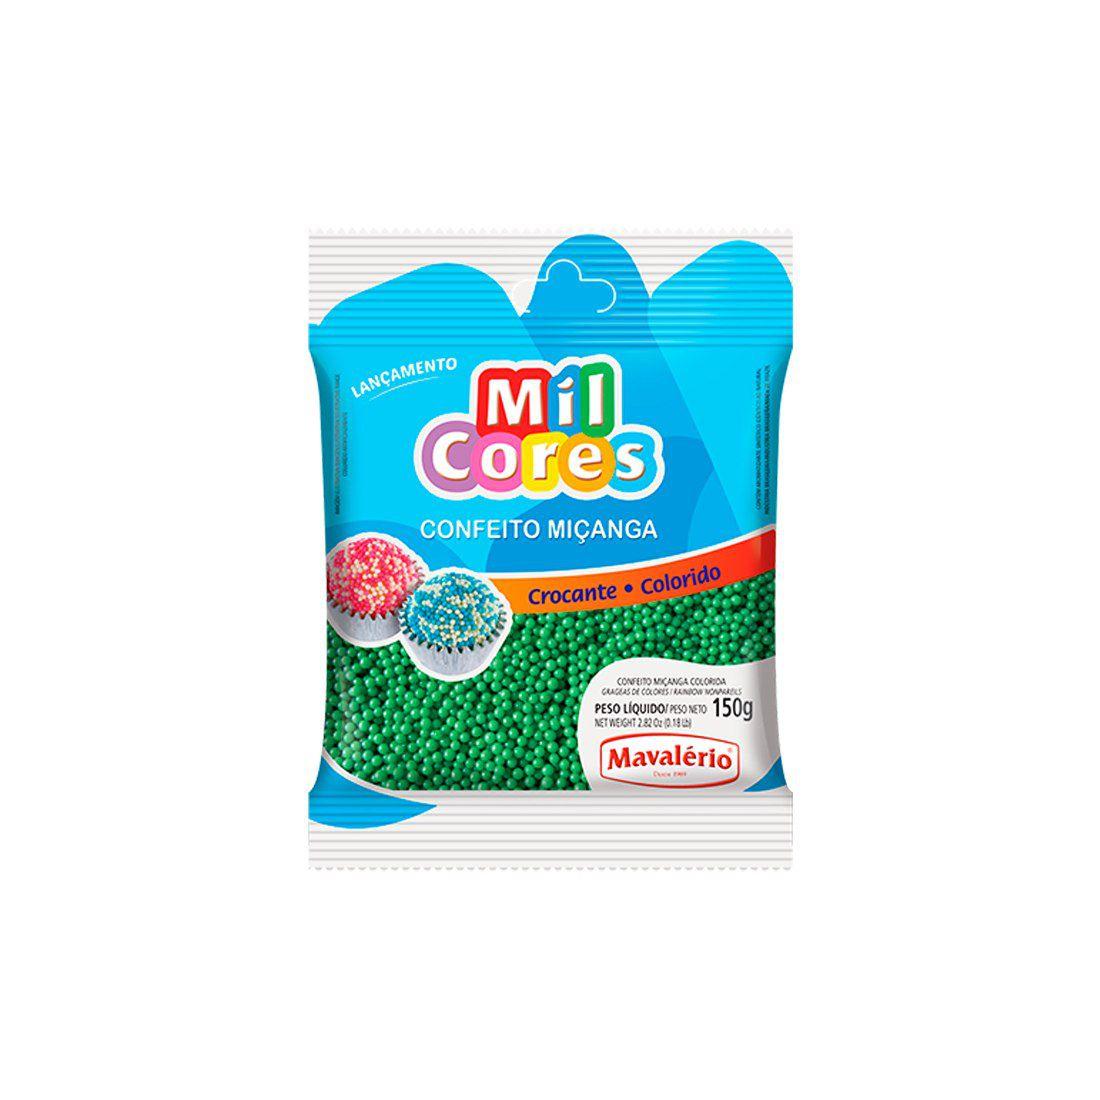 Confeito Miçanga Verde N.0 Mil Cores Mavalério 150g